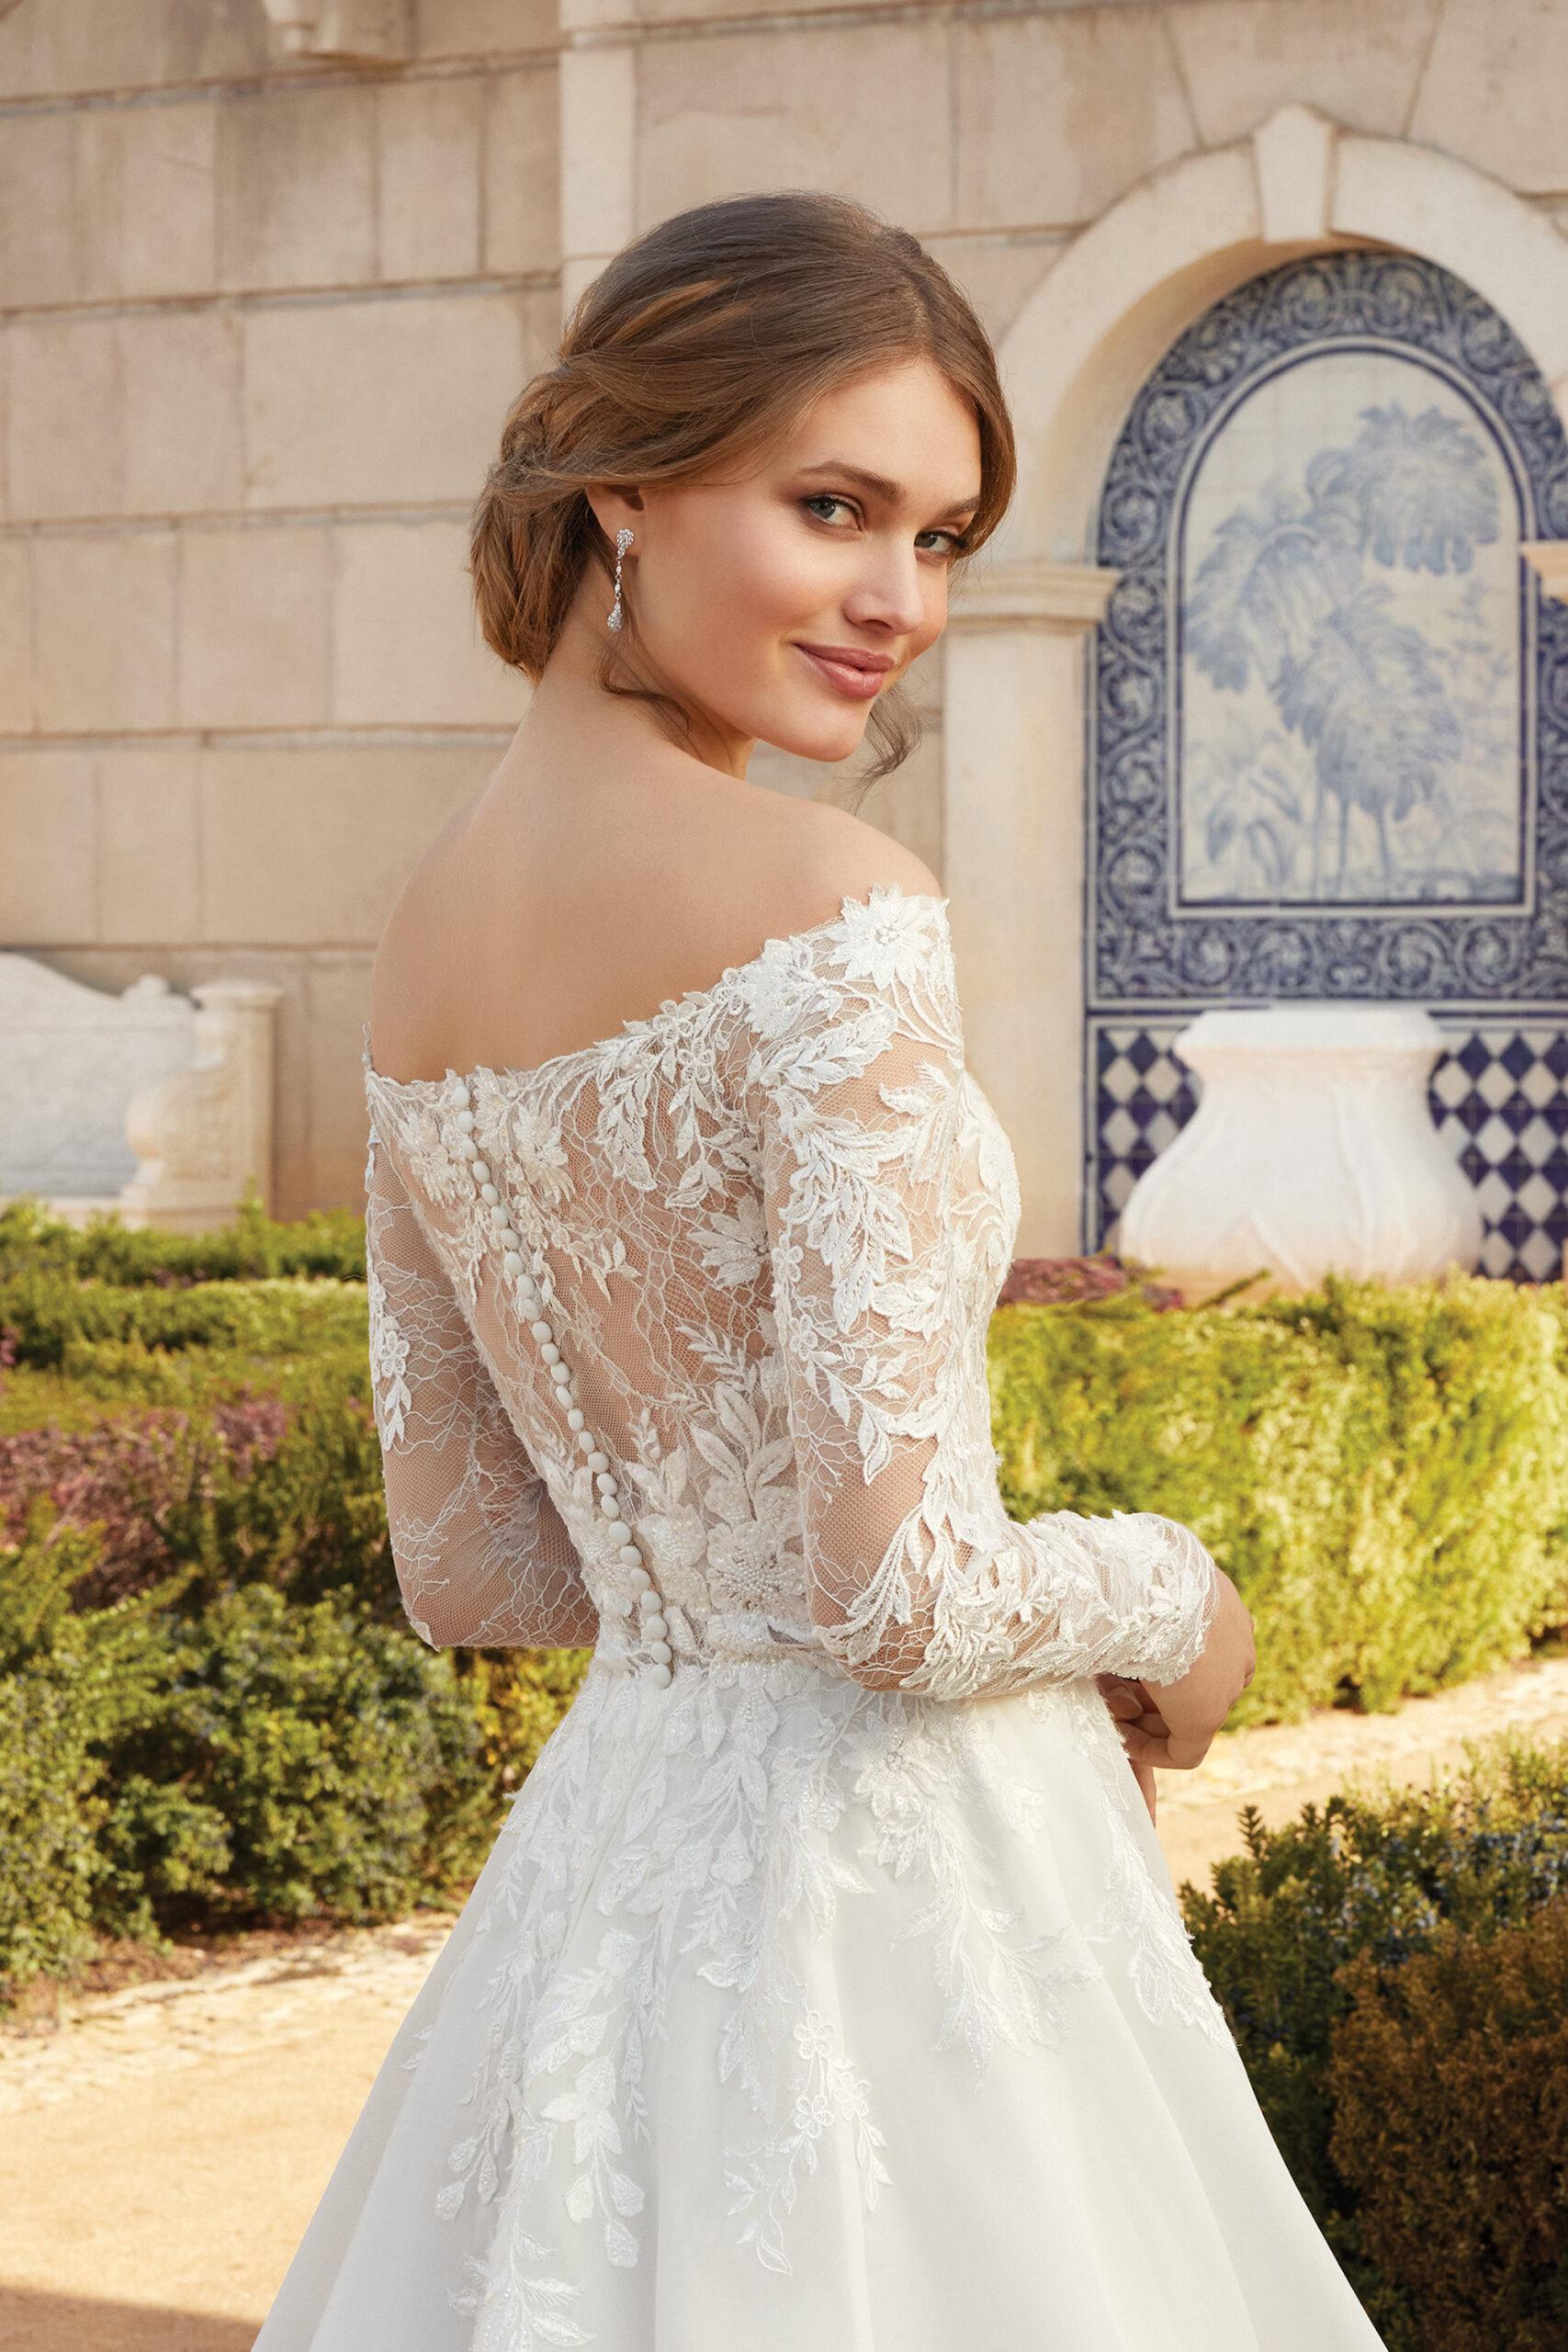 44238_BC_Sincerity-Bridal